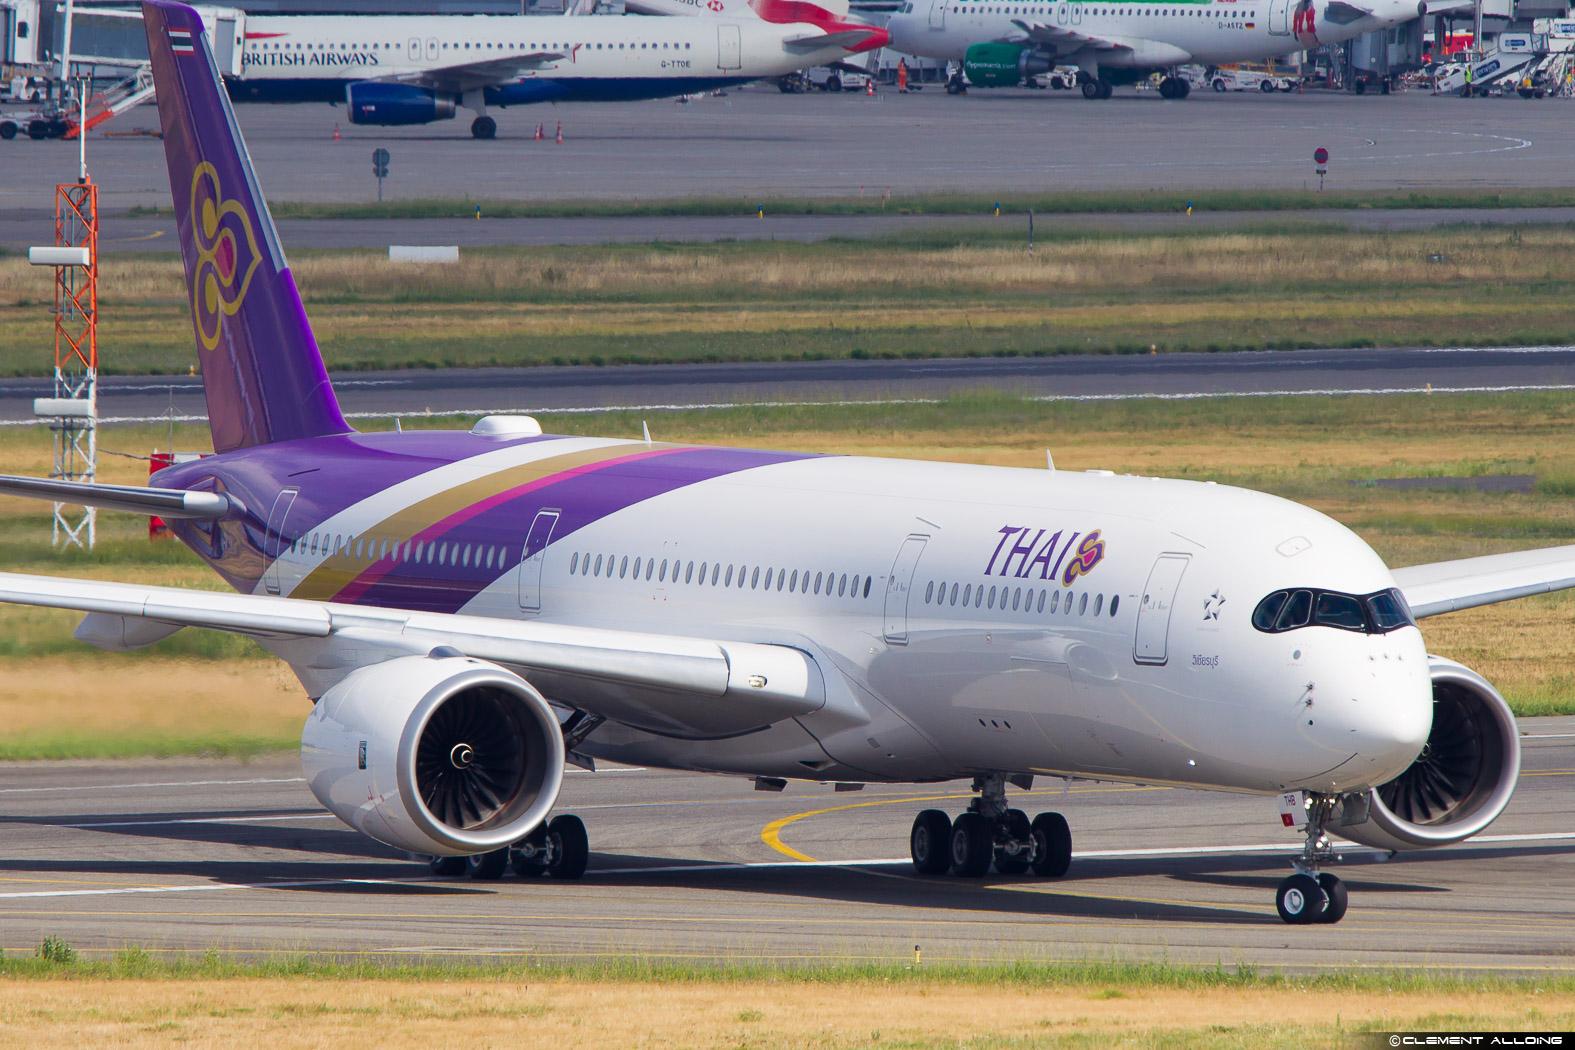 Thai Airways A350 (image: Clément Alloing)